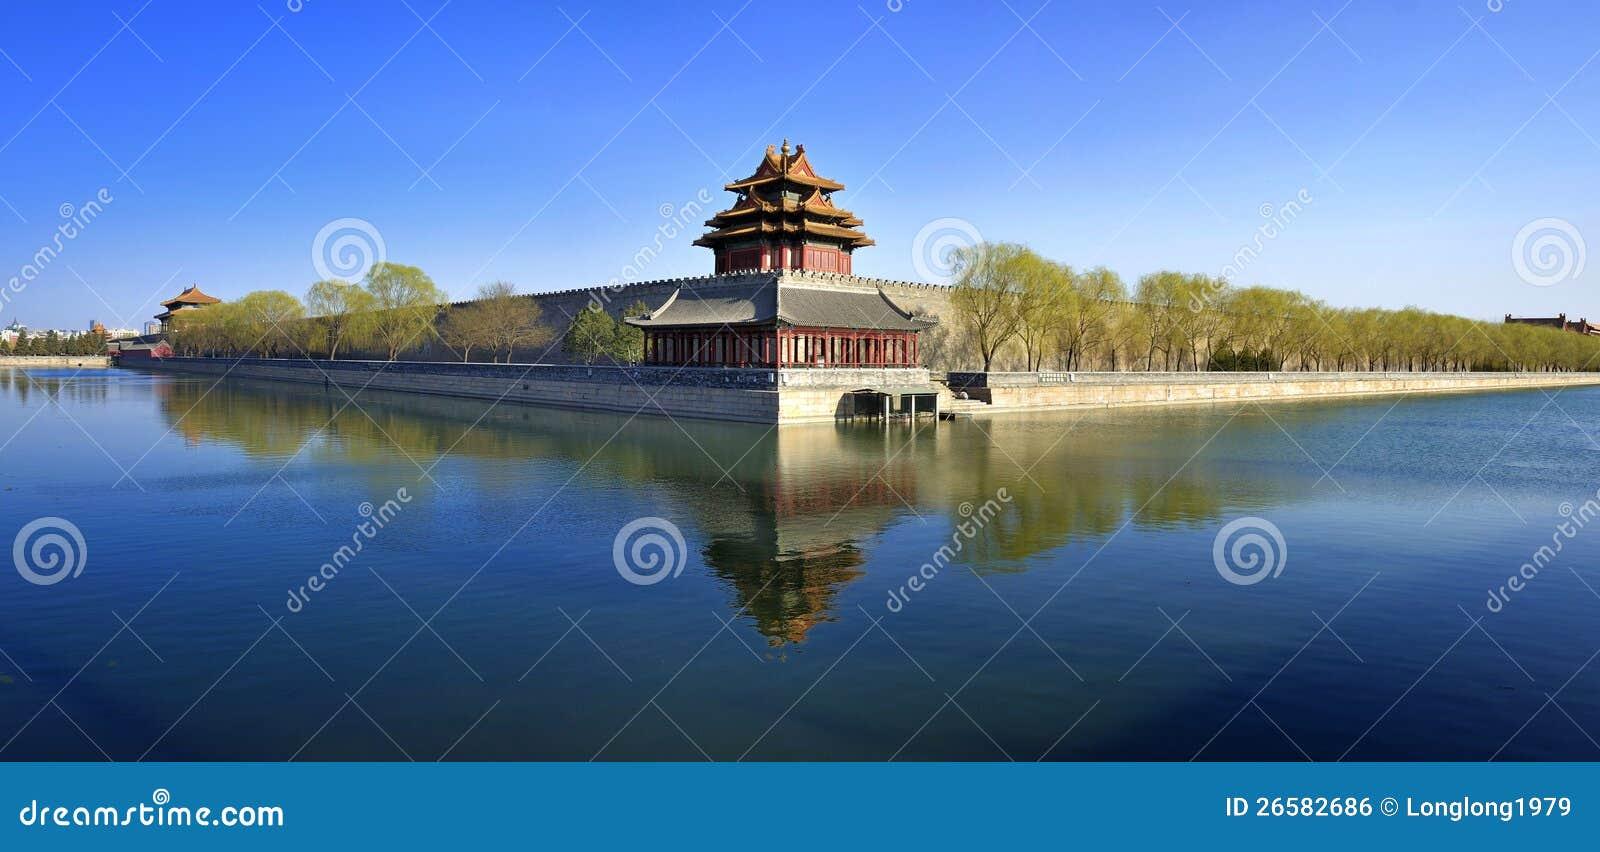 Forbidden City Panoramic,Beijing,China